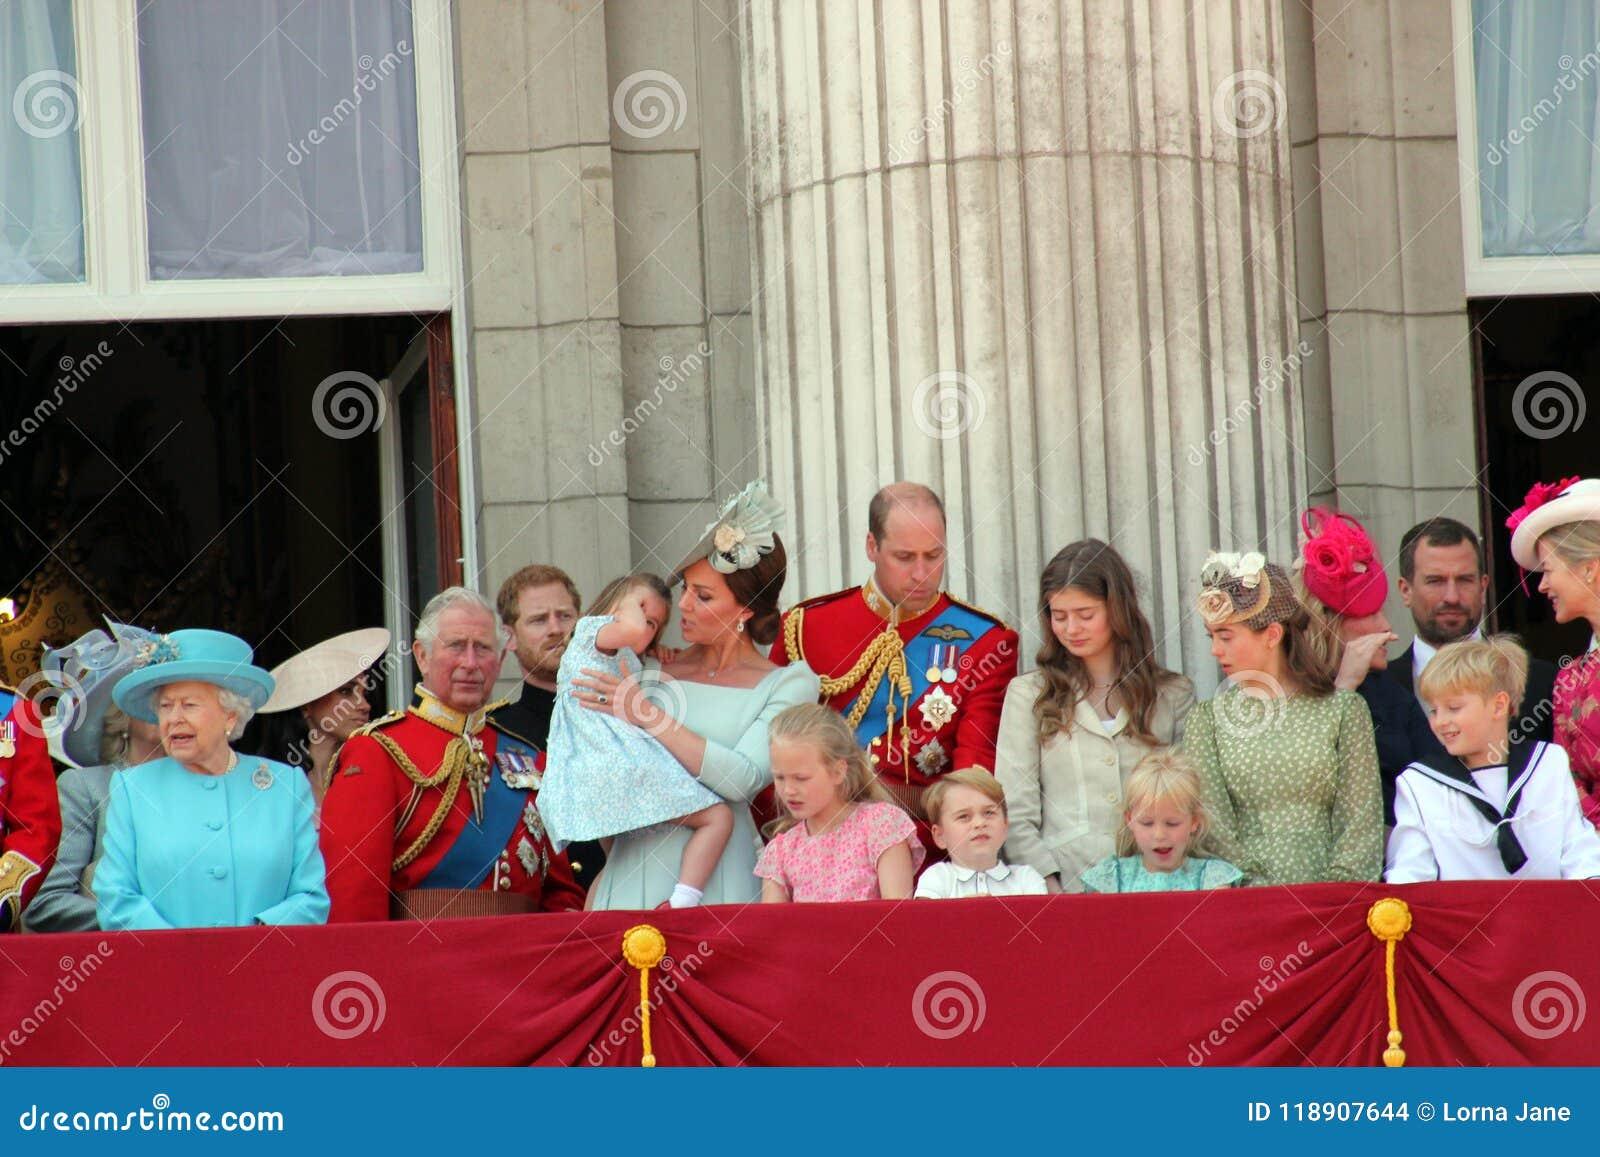 Queen Elizabeth, London, uk, 9th June 2018- Meghan Markle, Prince Harry, Prince George William, Charles, Kate Middleton & Princess